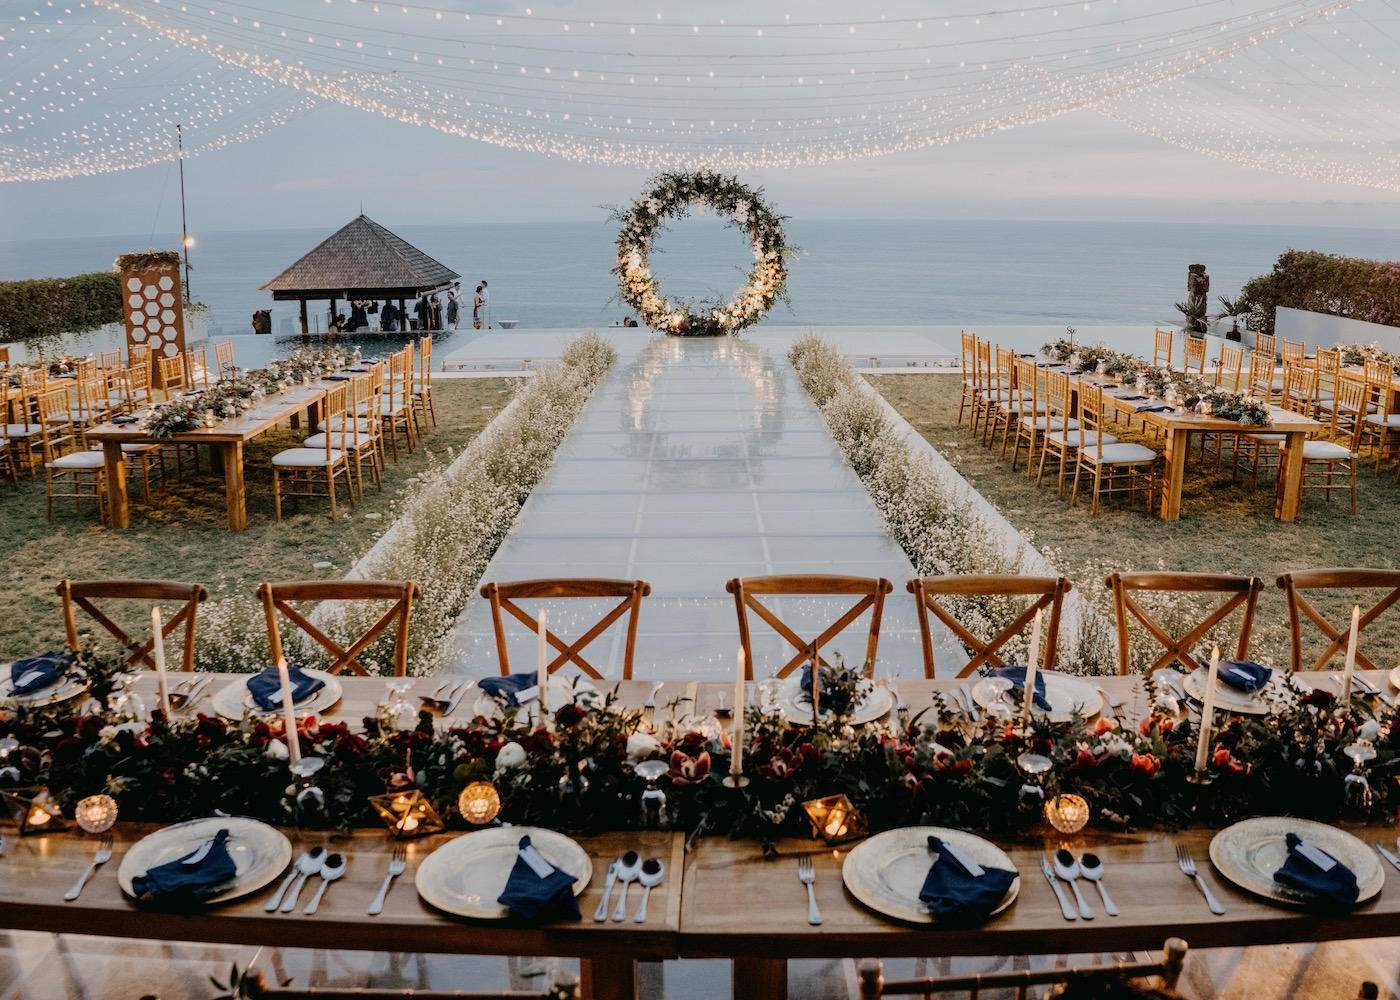 12 GORGEOUS WEDDING VENUES IN BALI | Honeycombers Bali